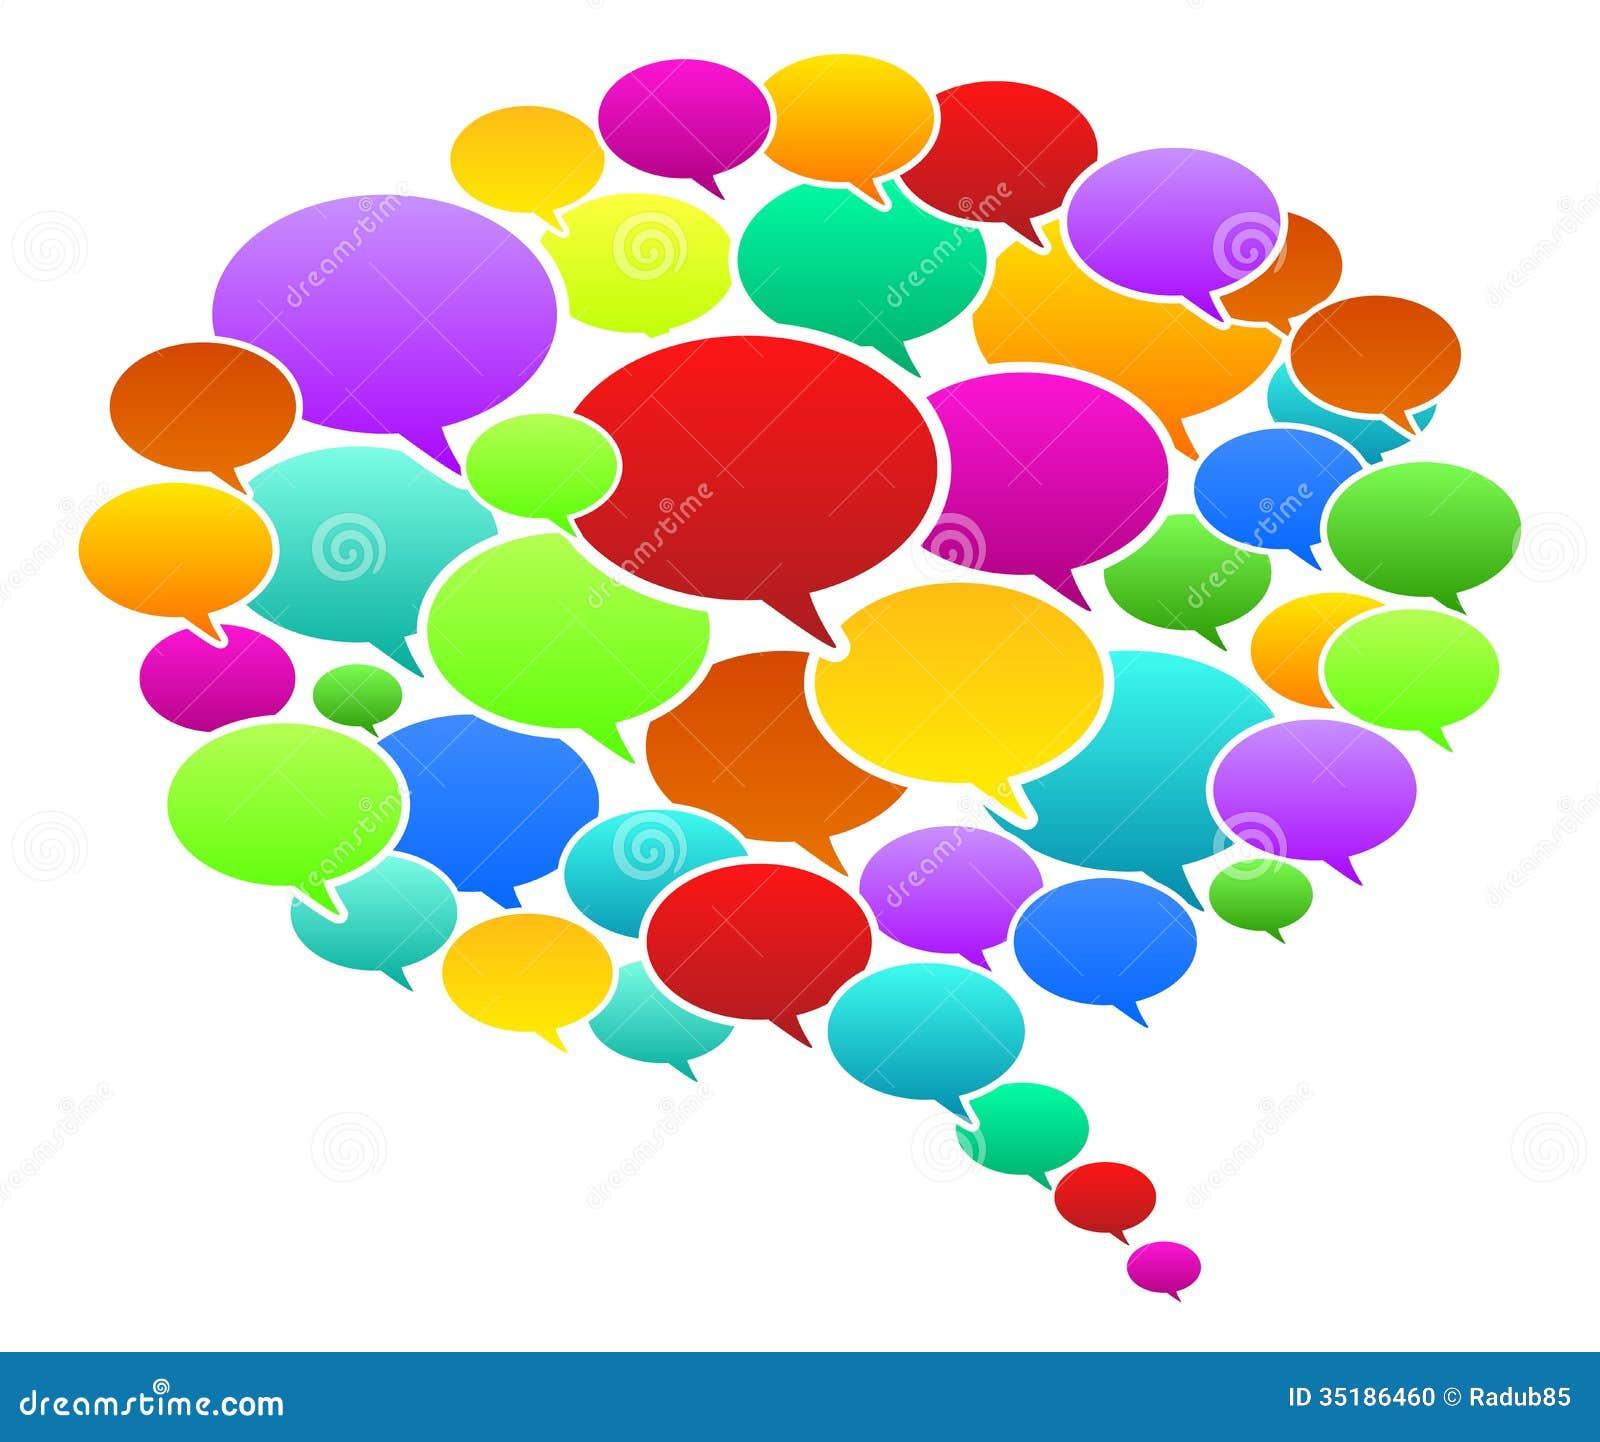 Colored Speech Bubbles Stock Photo Image 35186460